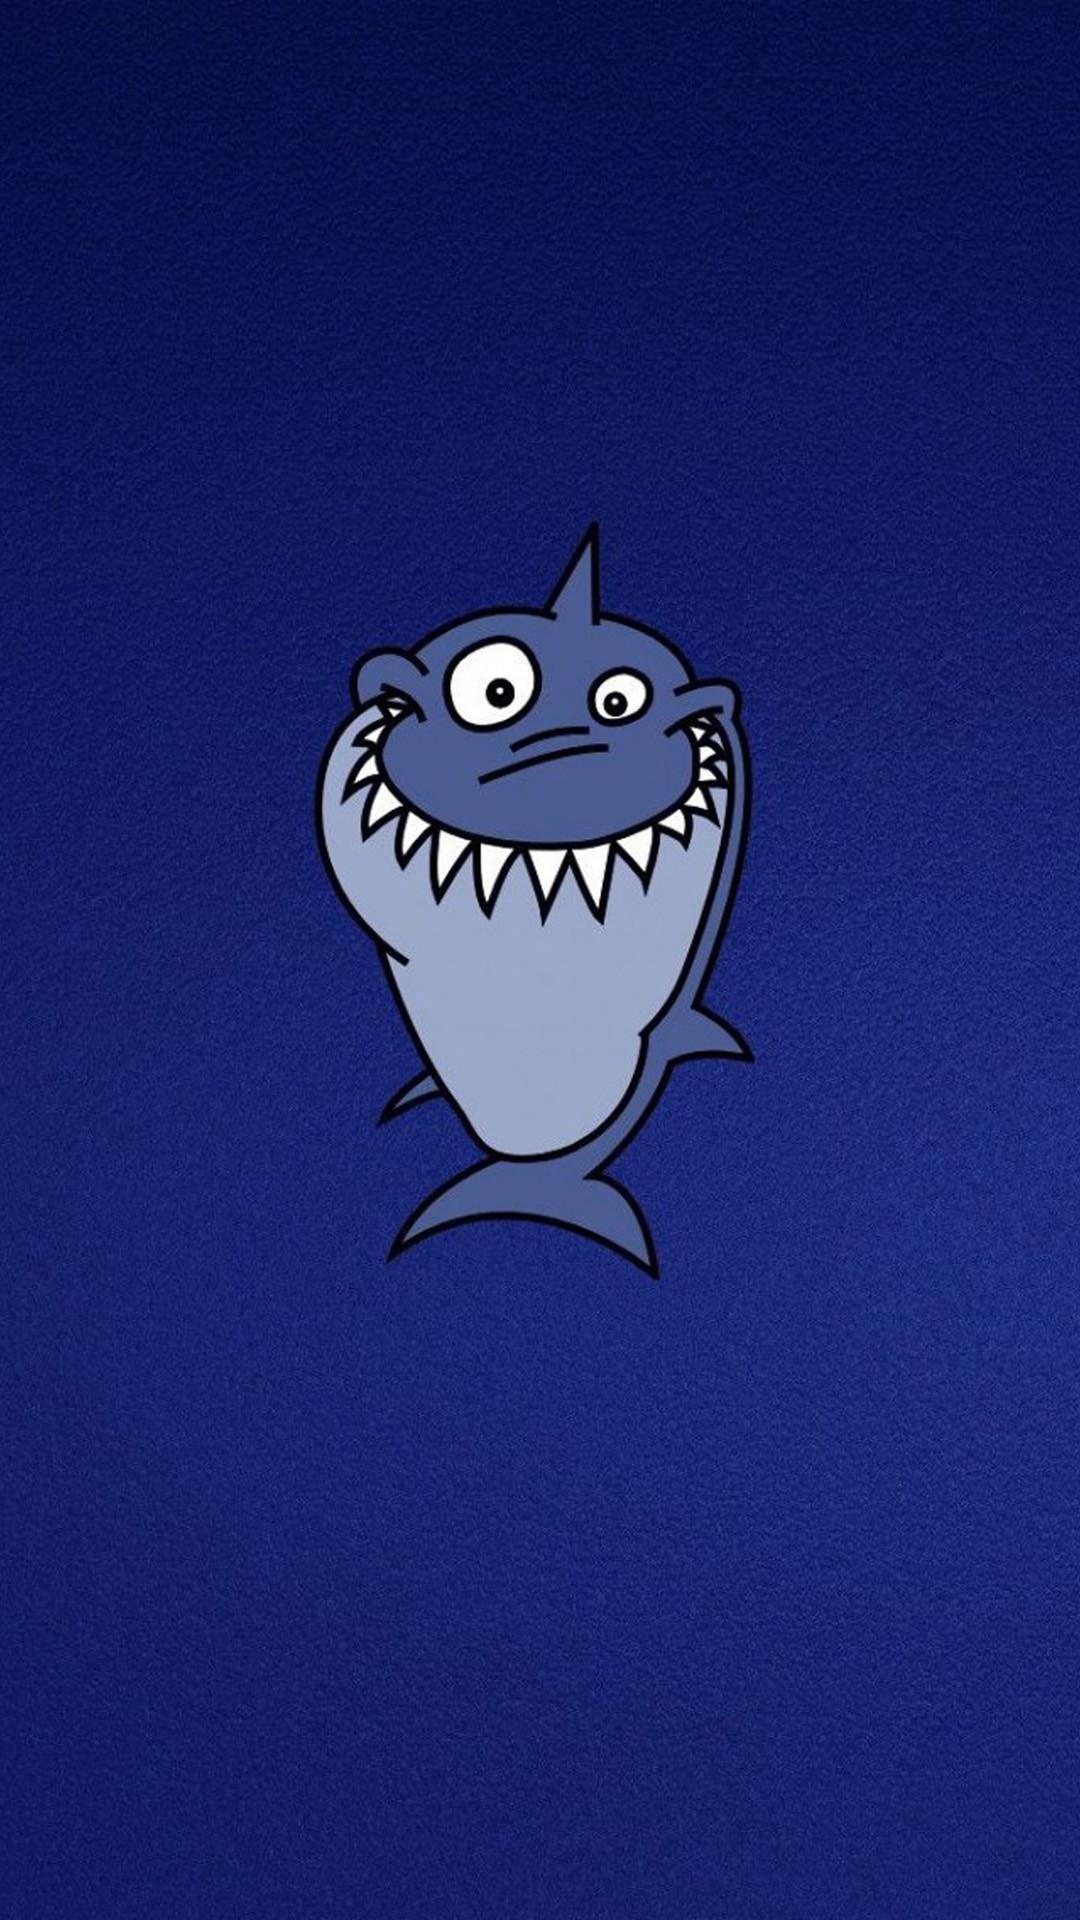 Funny Funny Shark HD Wallpaper iPhone 6 plus